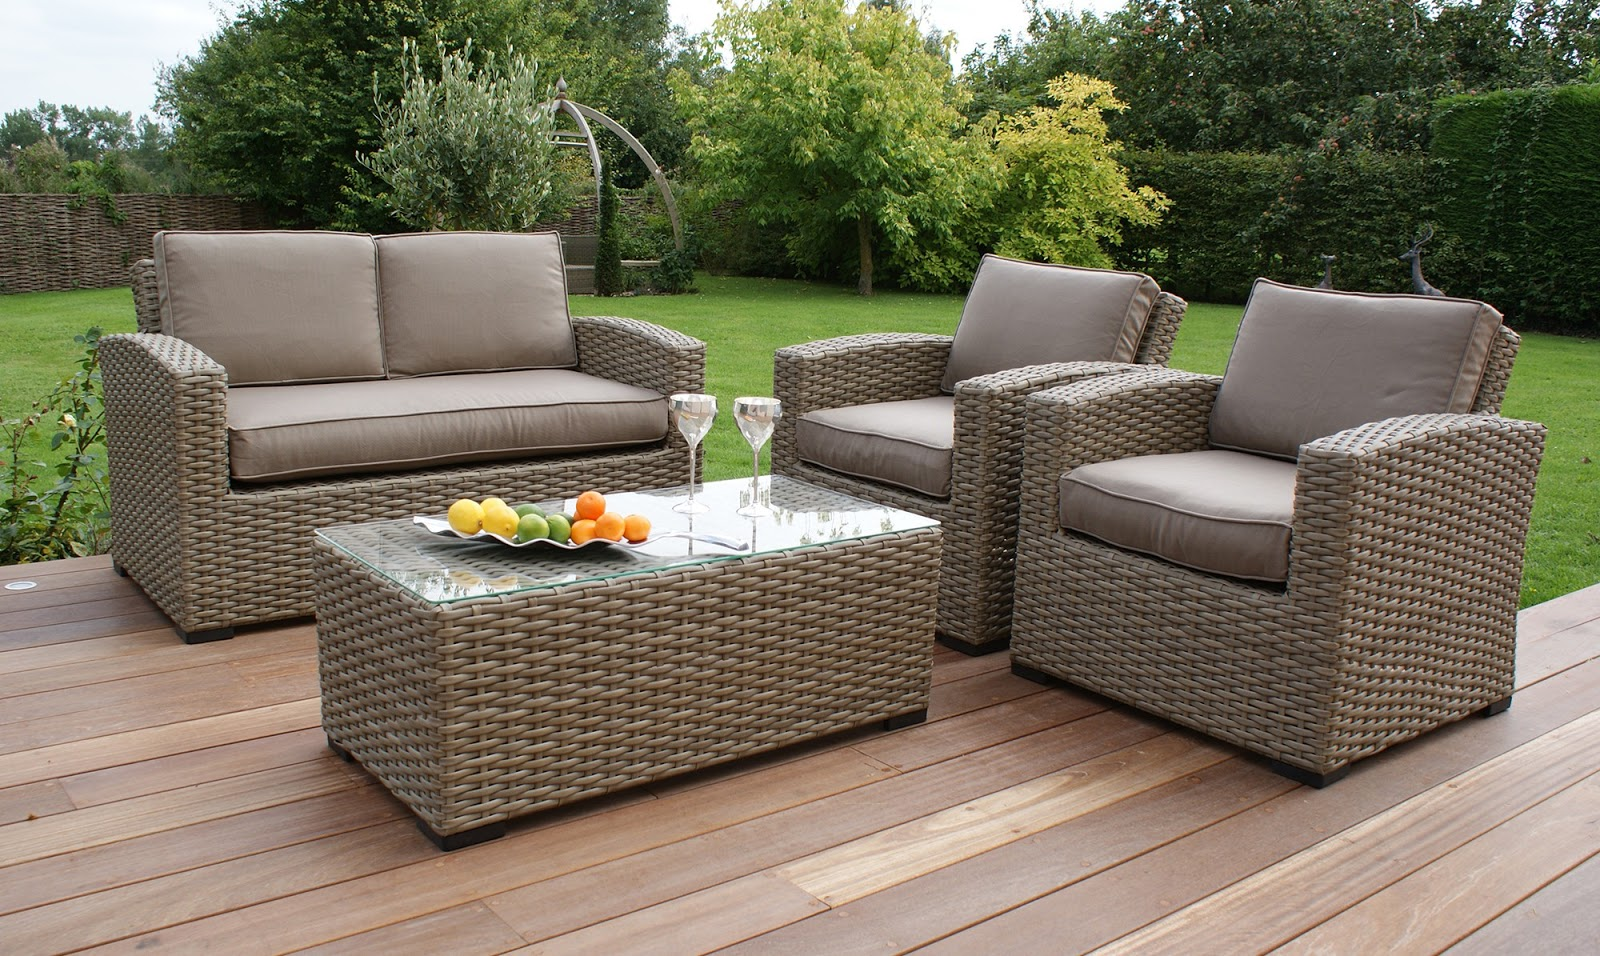 Rattan Garden Furniture & Plastic Rattan Furniture - 1 ...